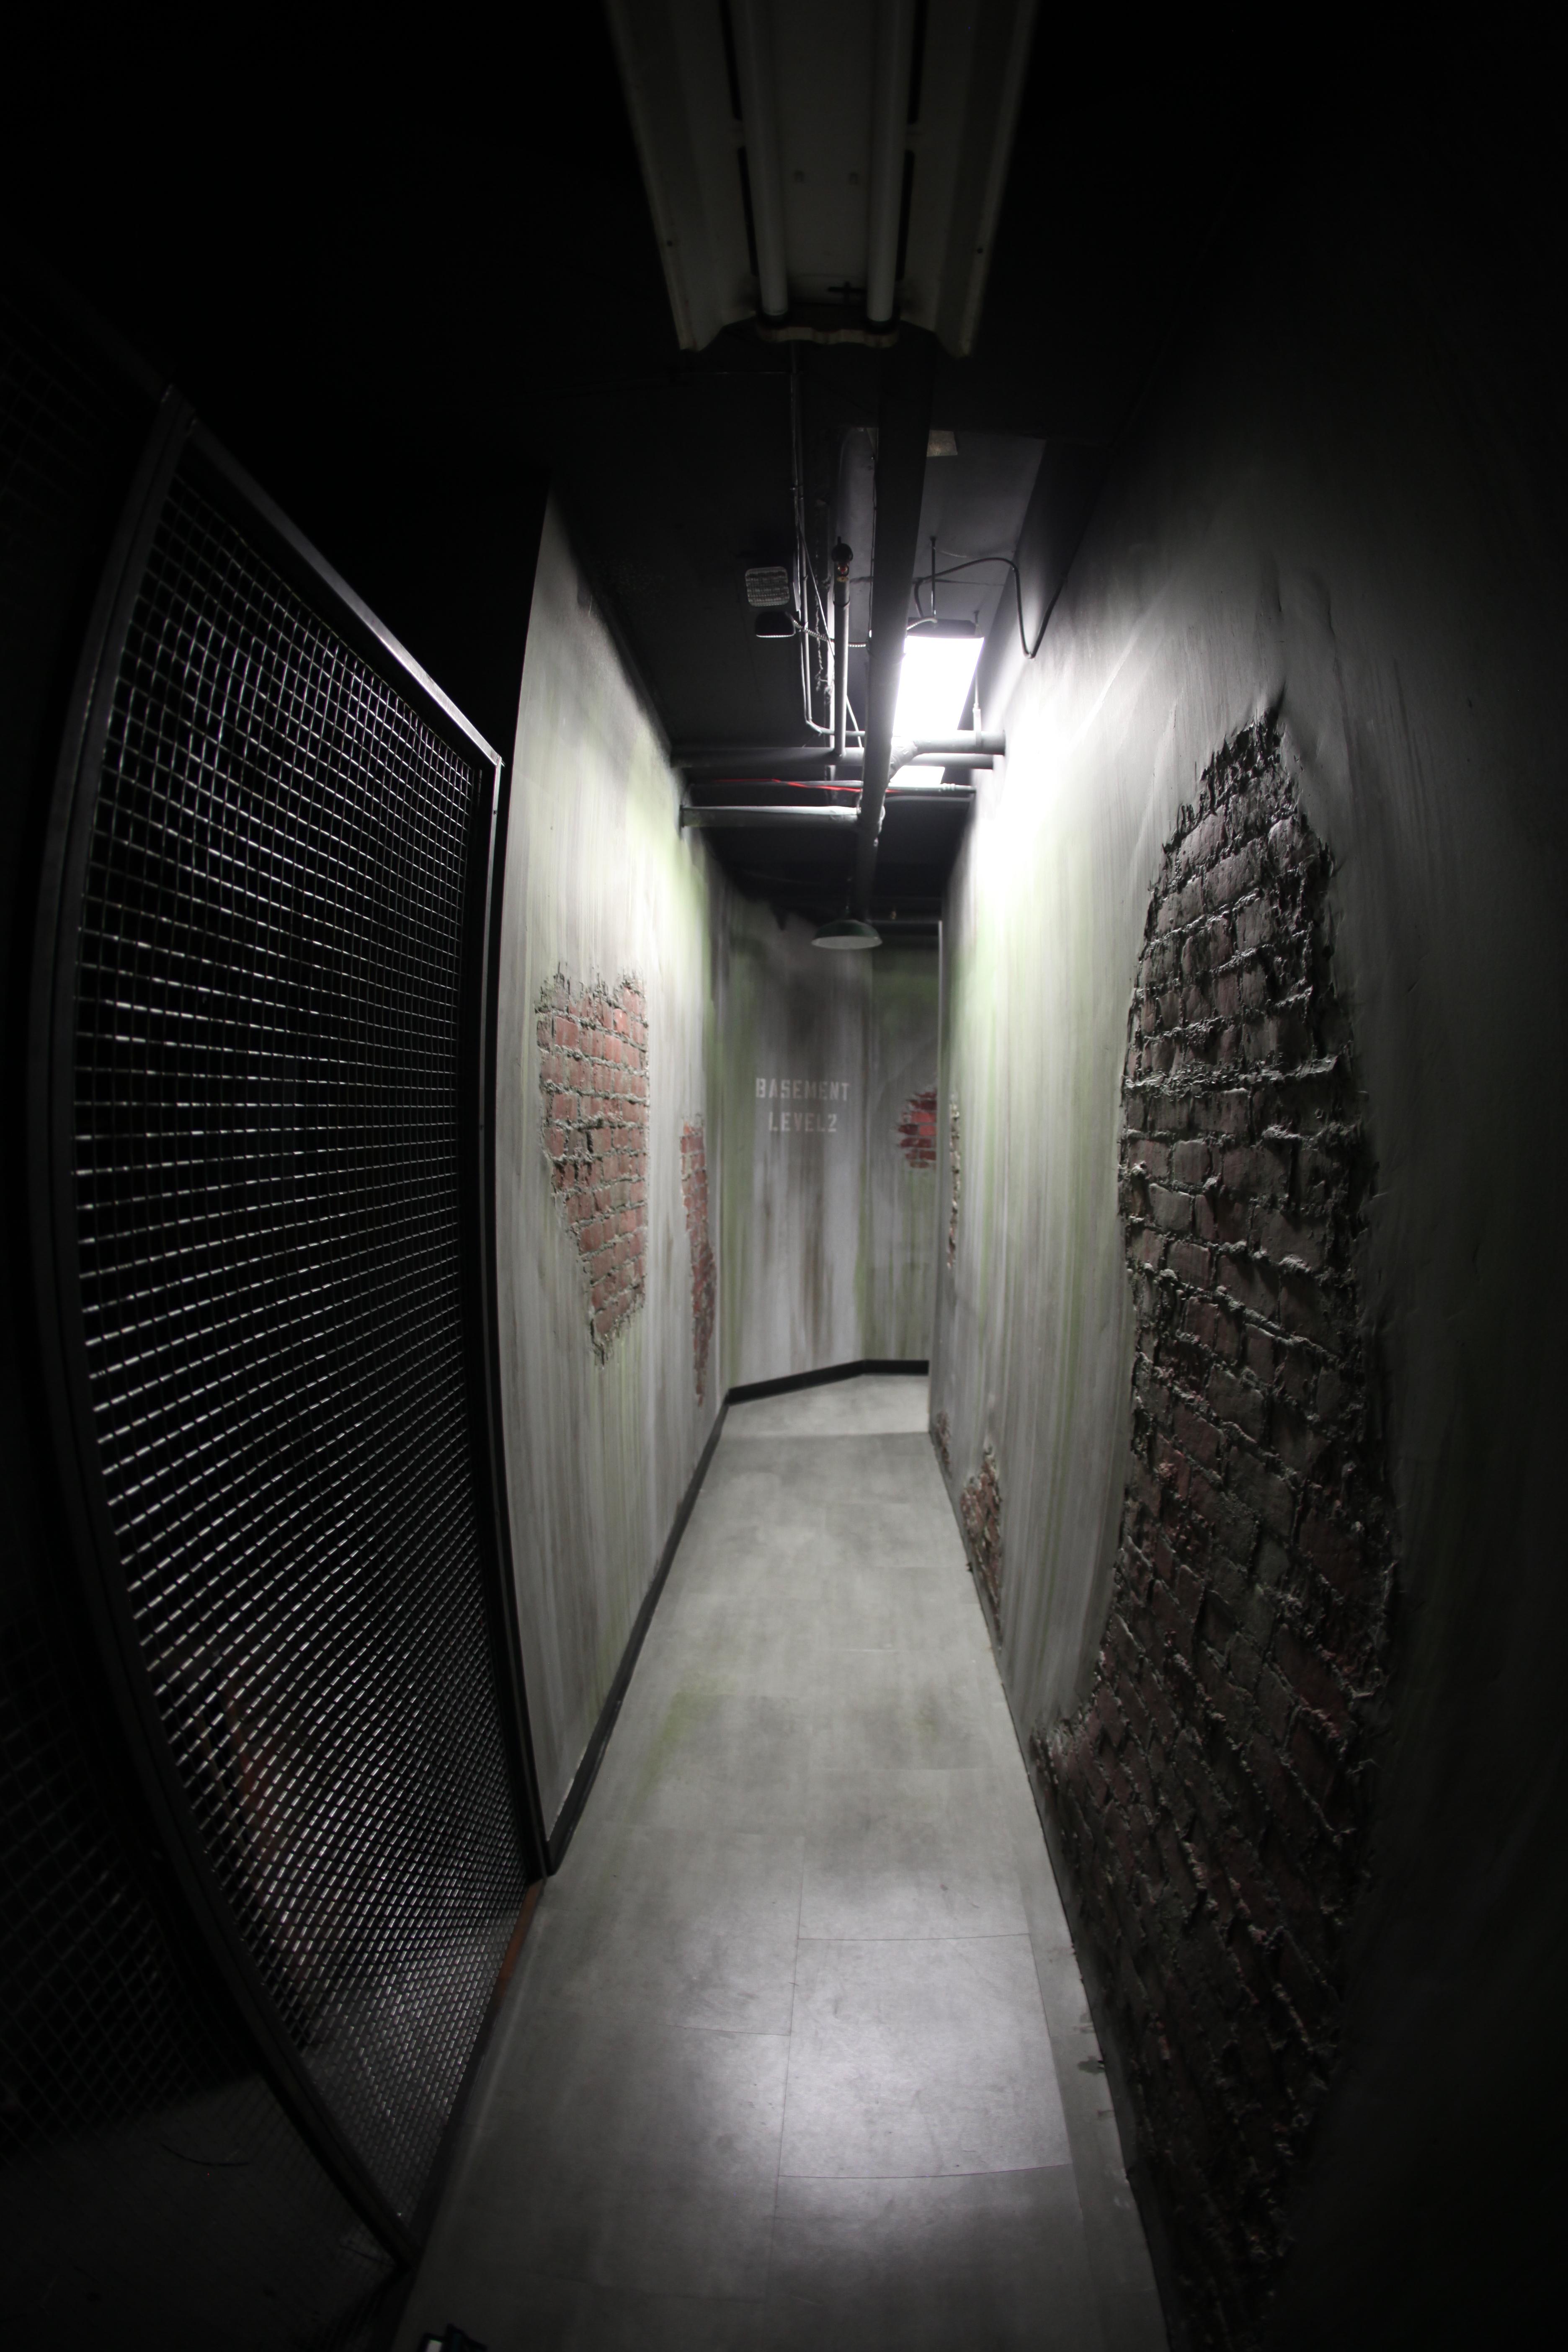 mb-hl-basement1.jpg